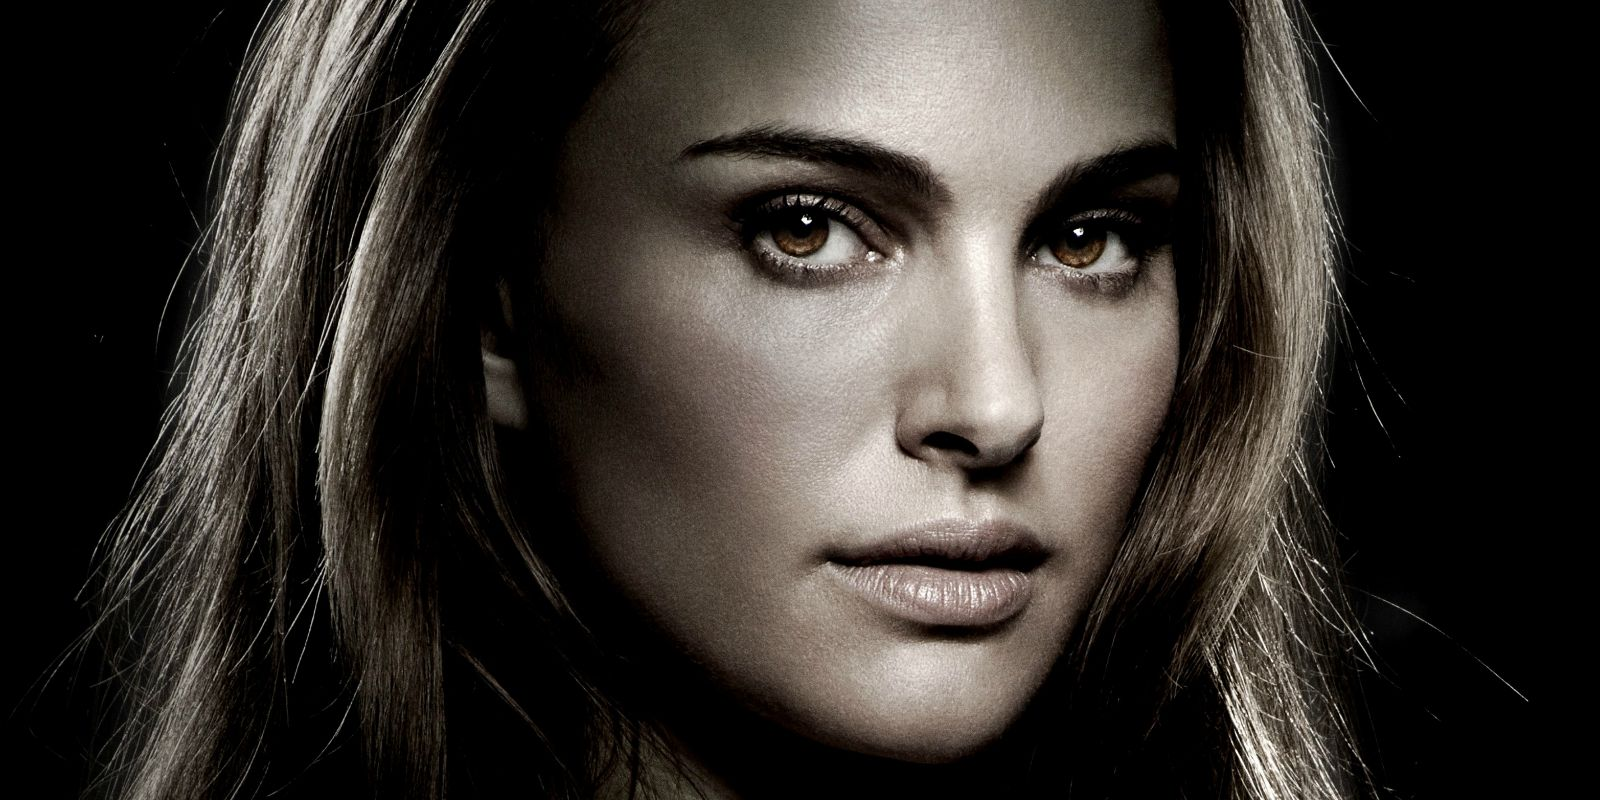 Natalie Portman on Future Marvel Films: 'As Far As I Know ... Natalie Portman